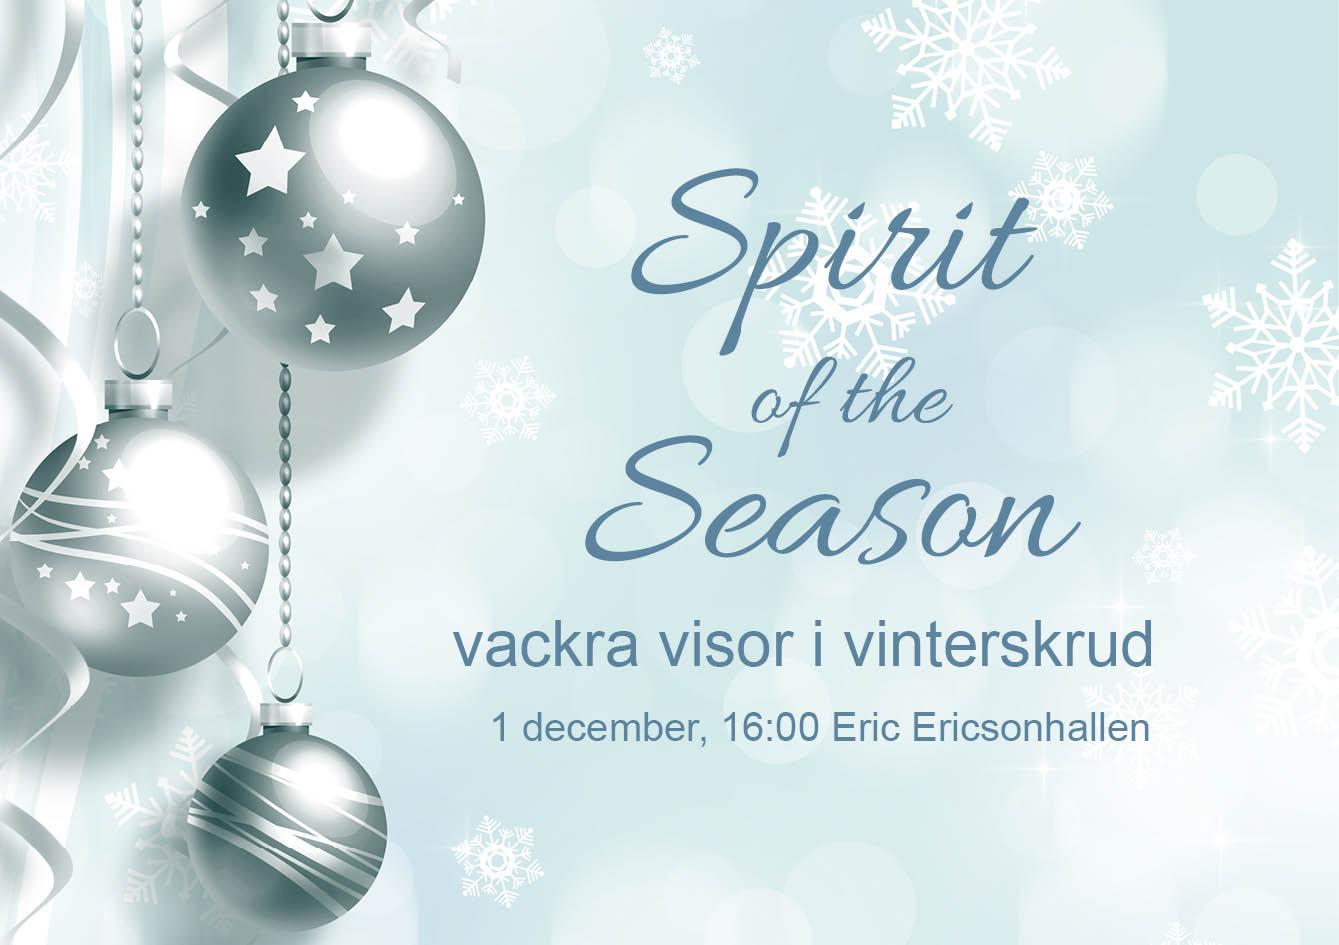 SPIRIT OF THE SEASON - Vackra visor i vinterskrud